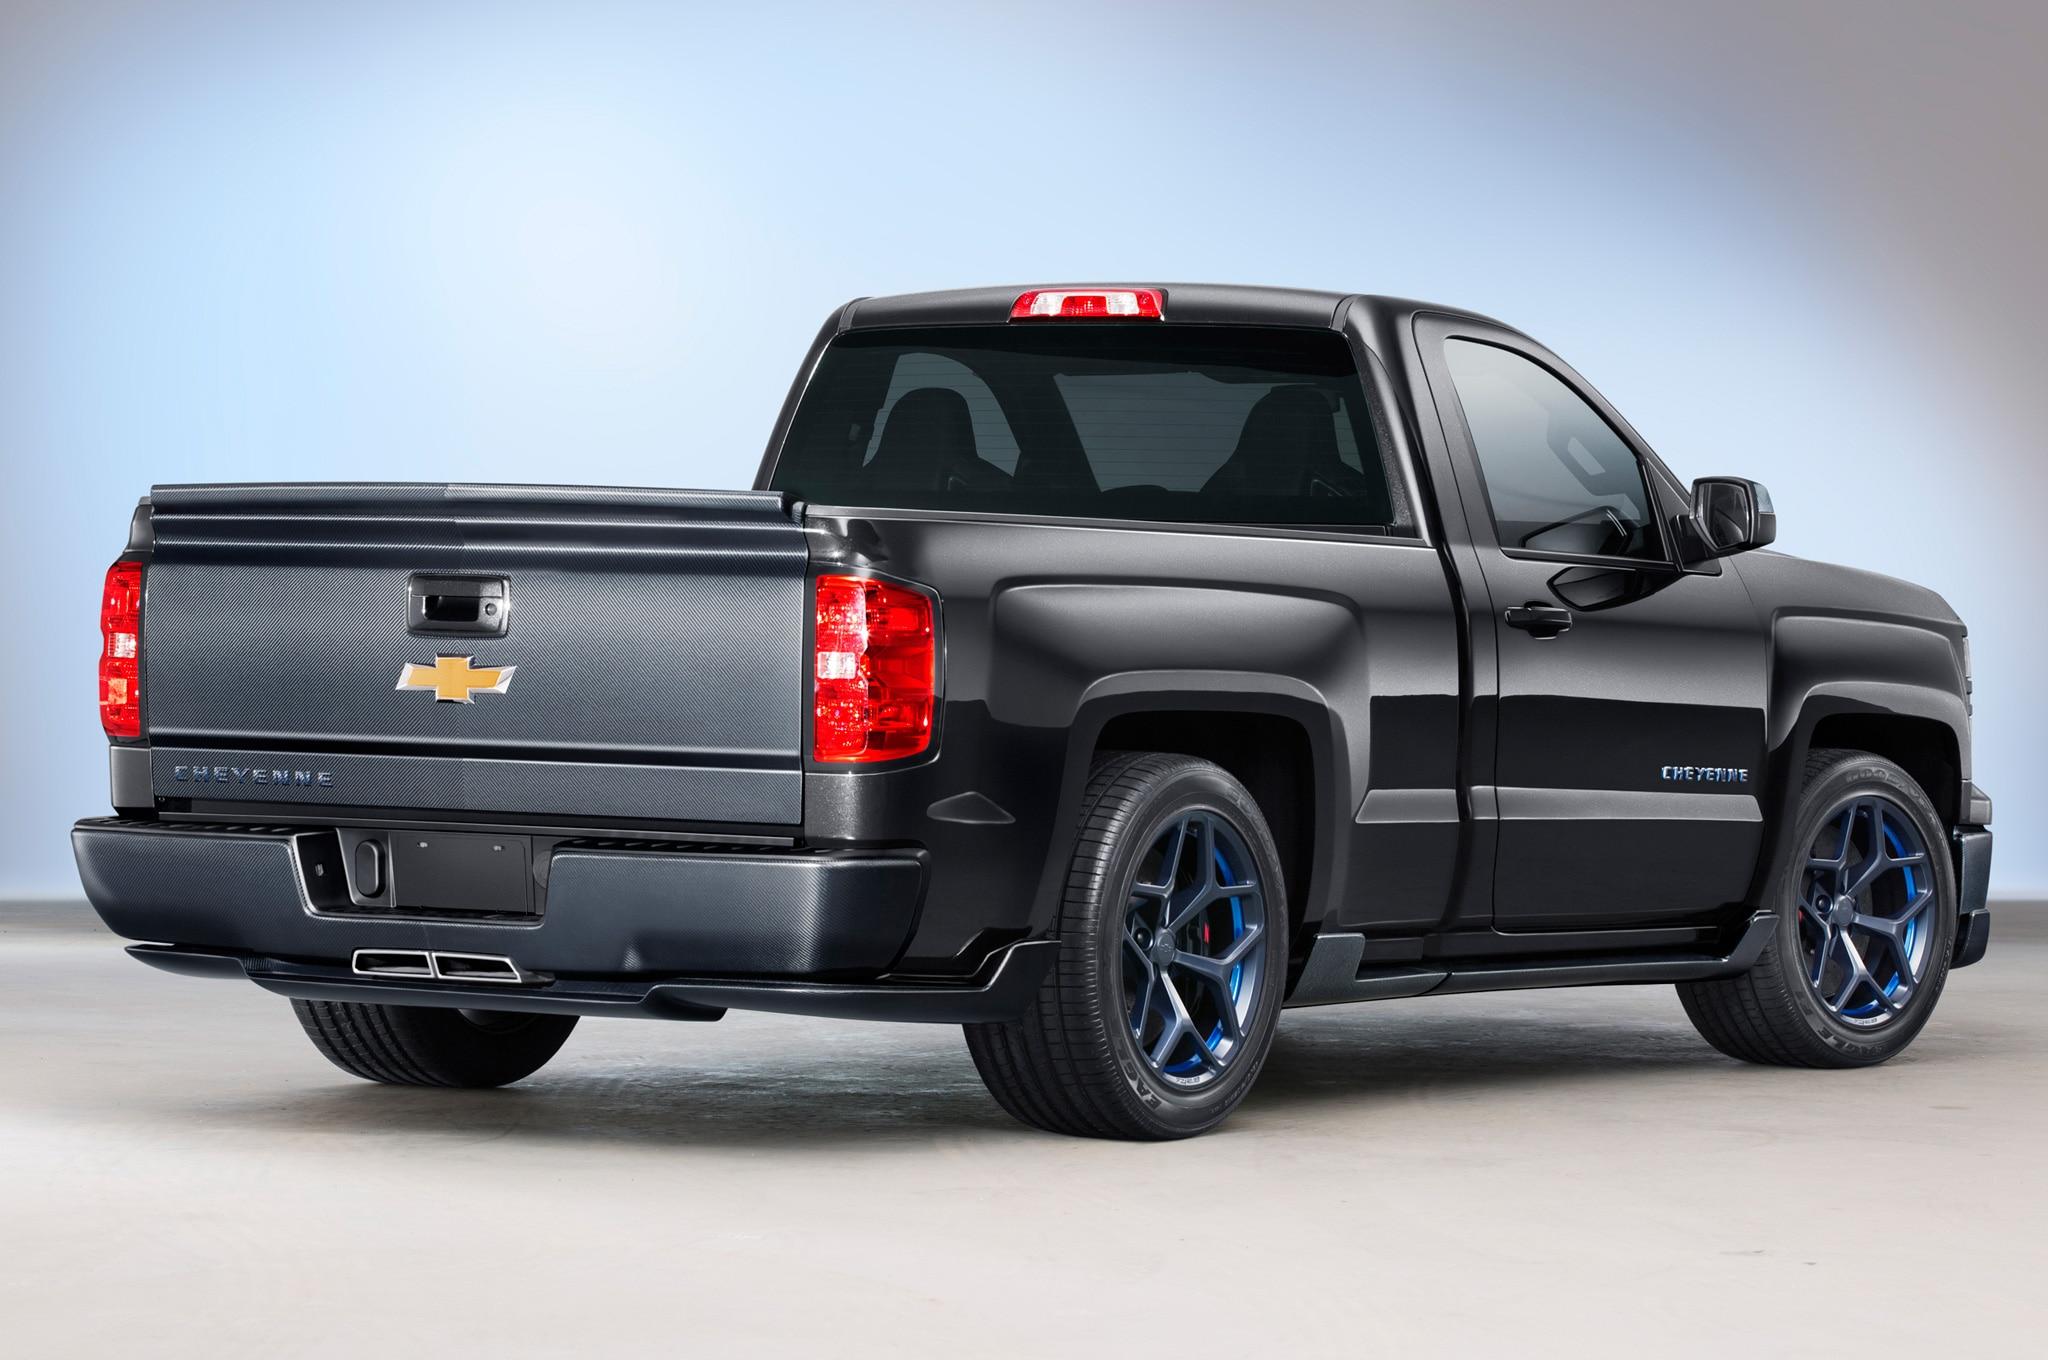 2014 Chevrolet Silverado Cheyenne SEMA Concept Revealed